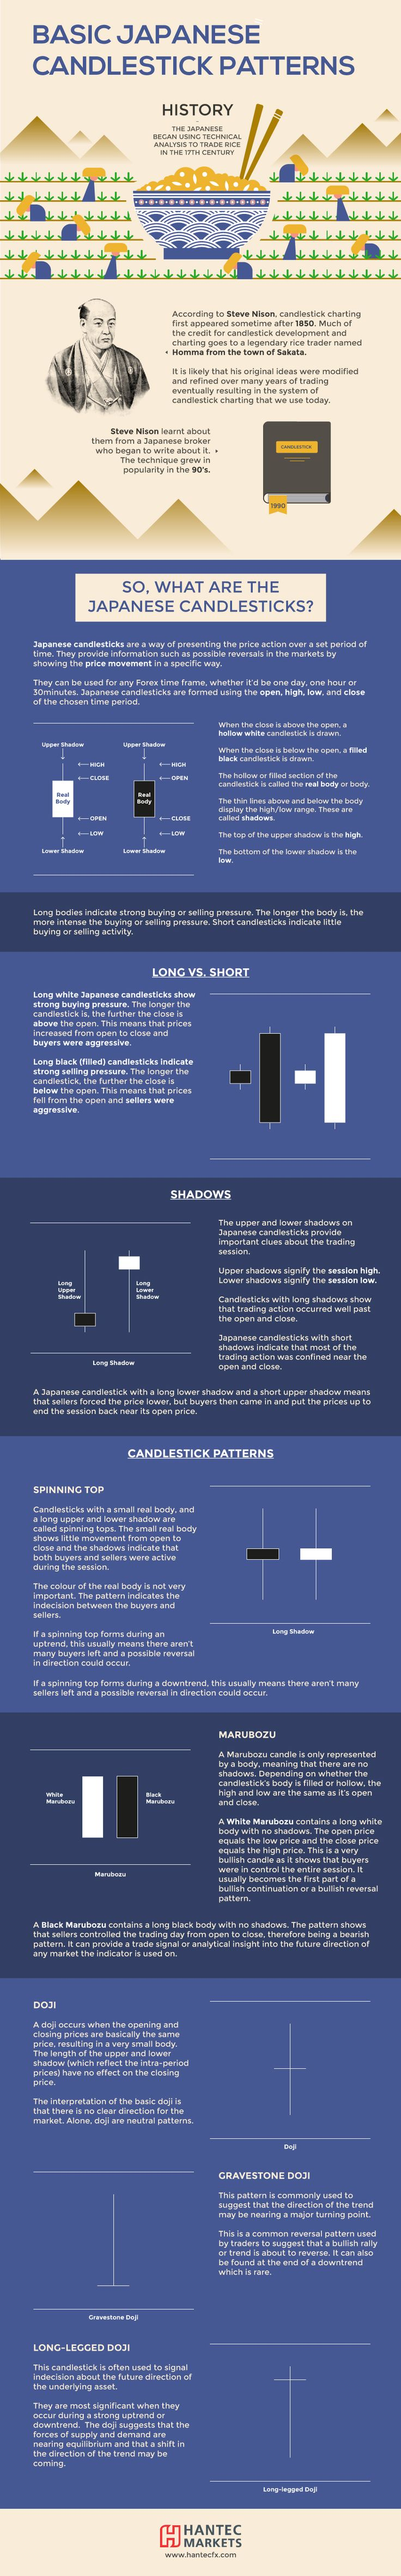 BASIC JAPANESE CANDLESTICK PATTERNS #infographic #Business #ForexTrading http://www.tradingprofits4u.com/